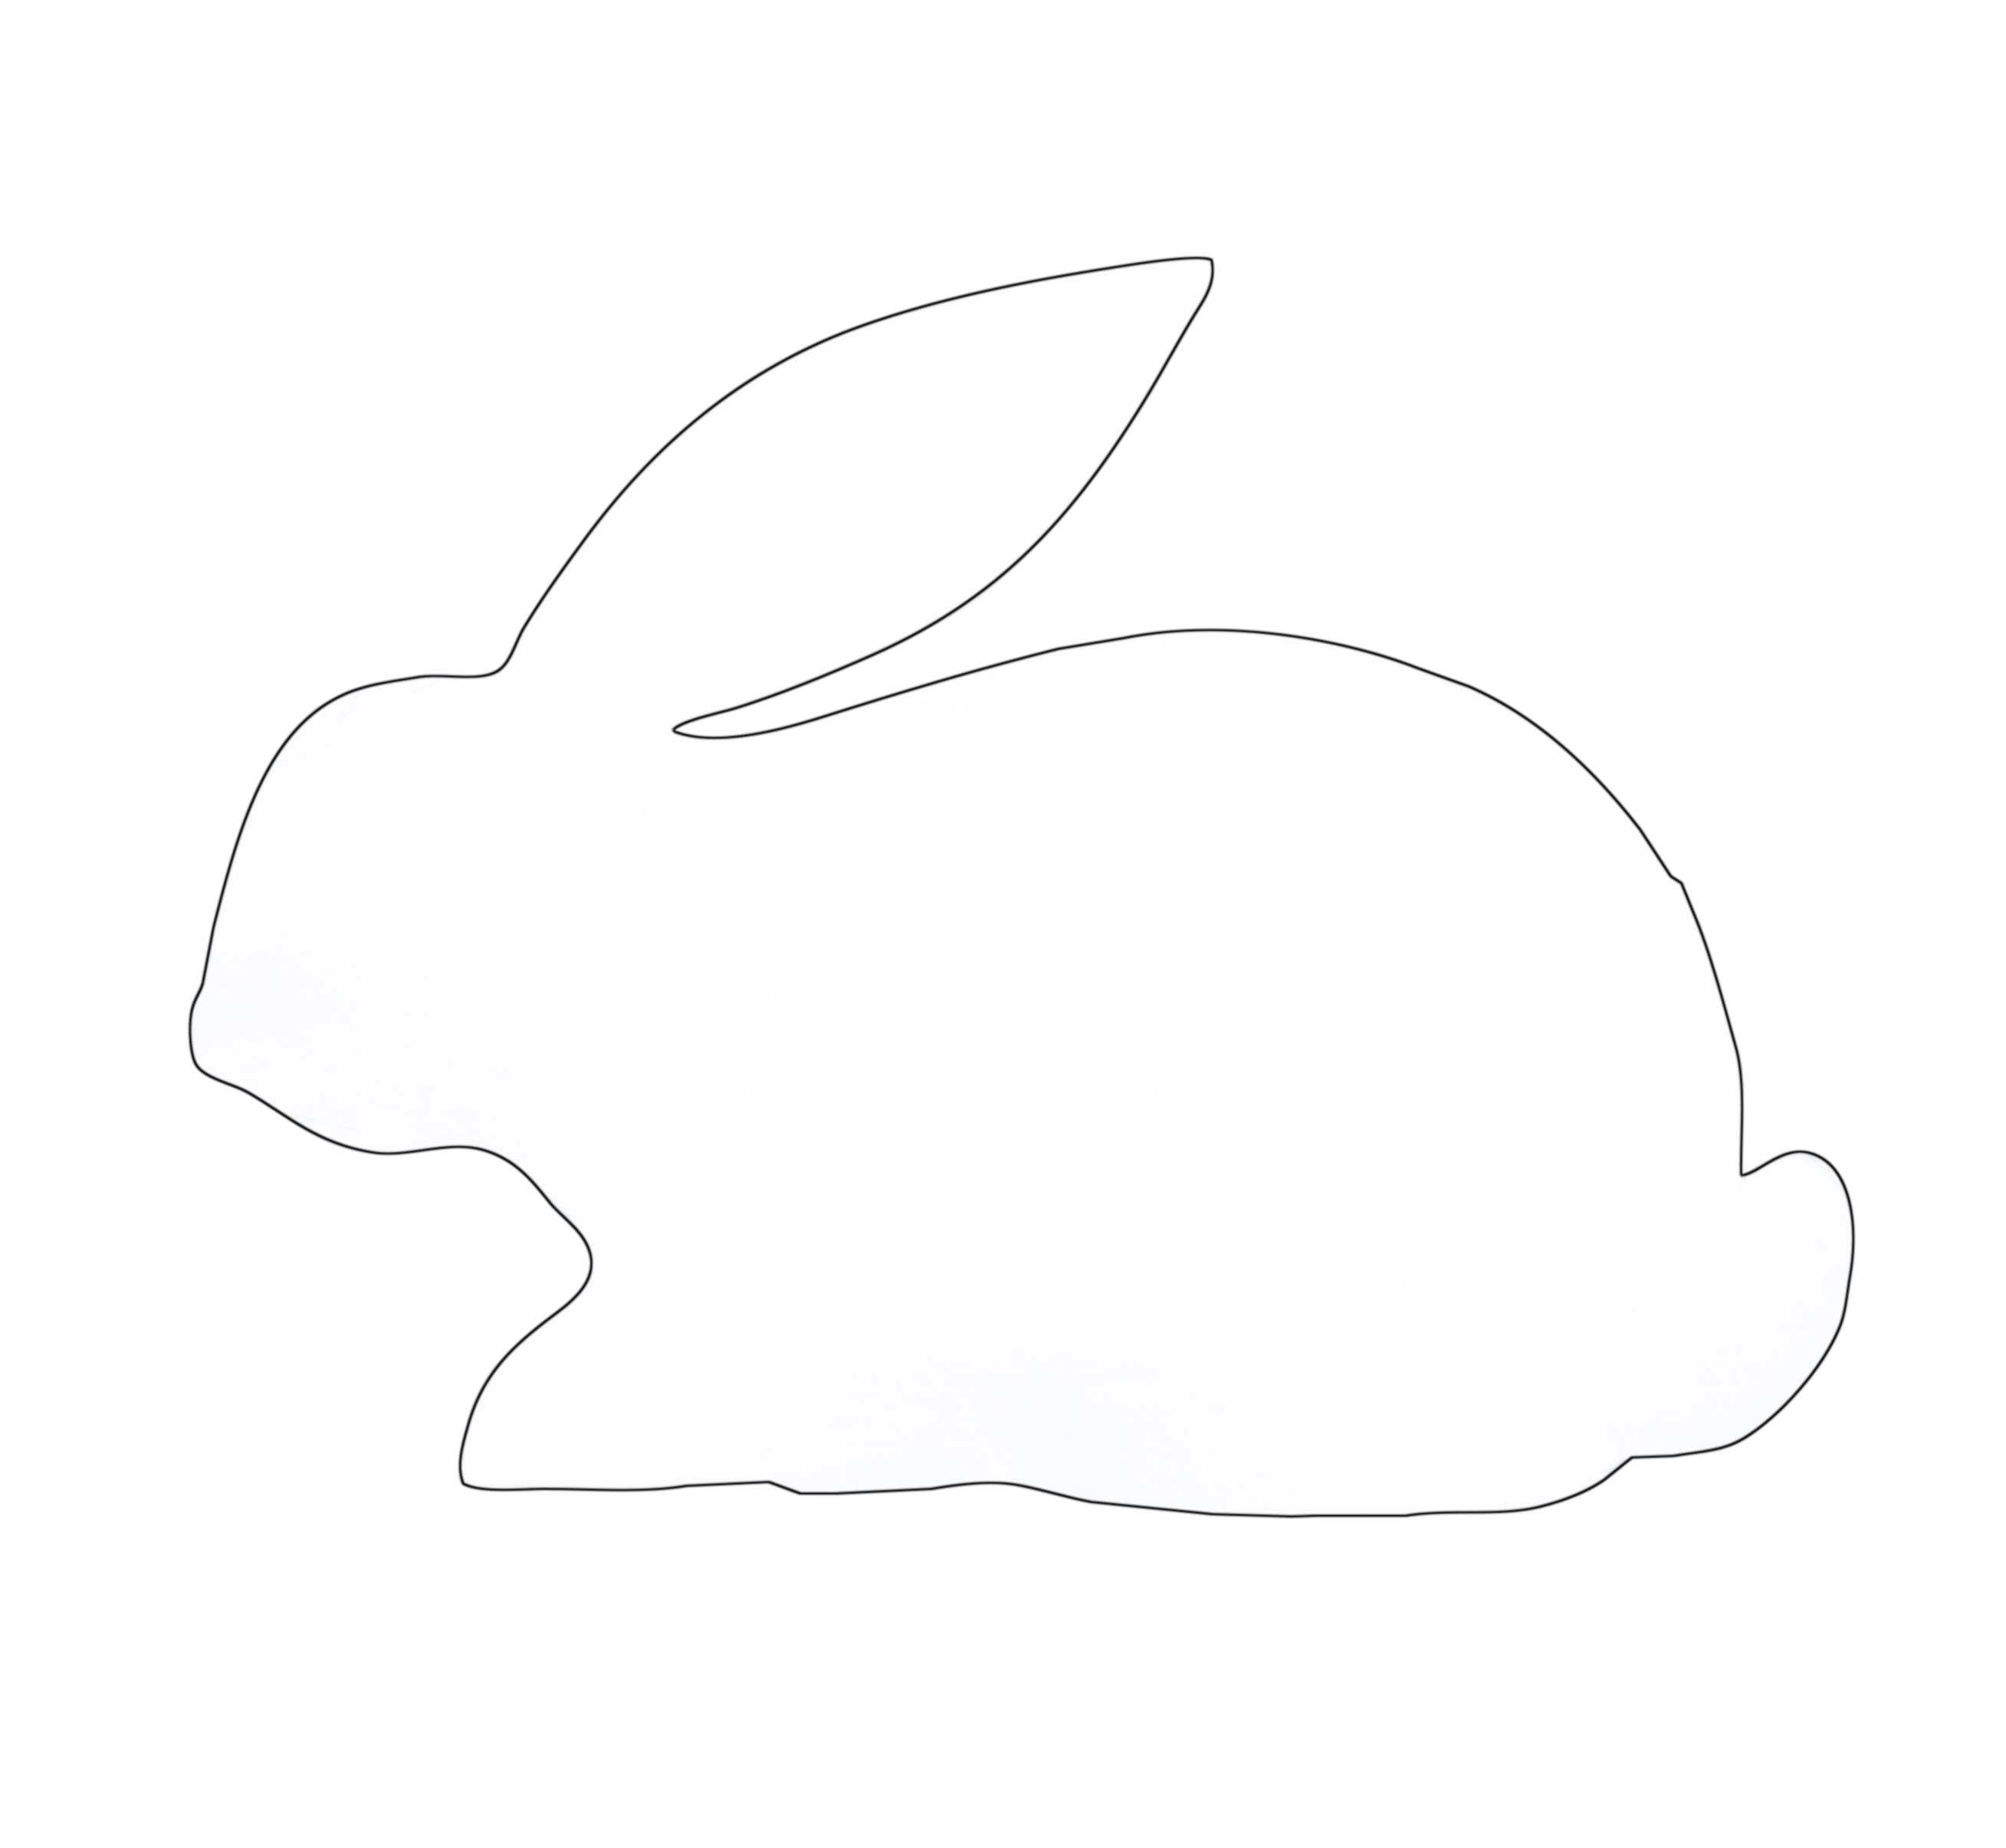 Bunny Rabbit Outline.